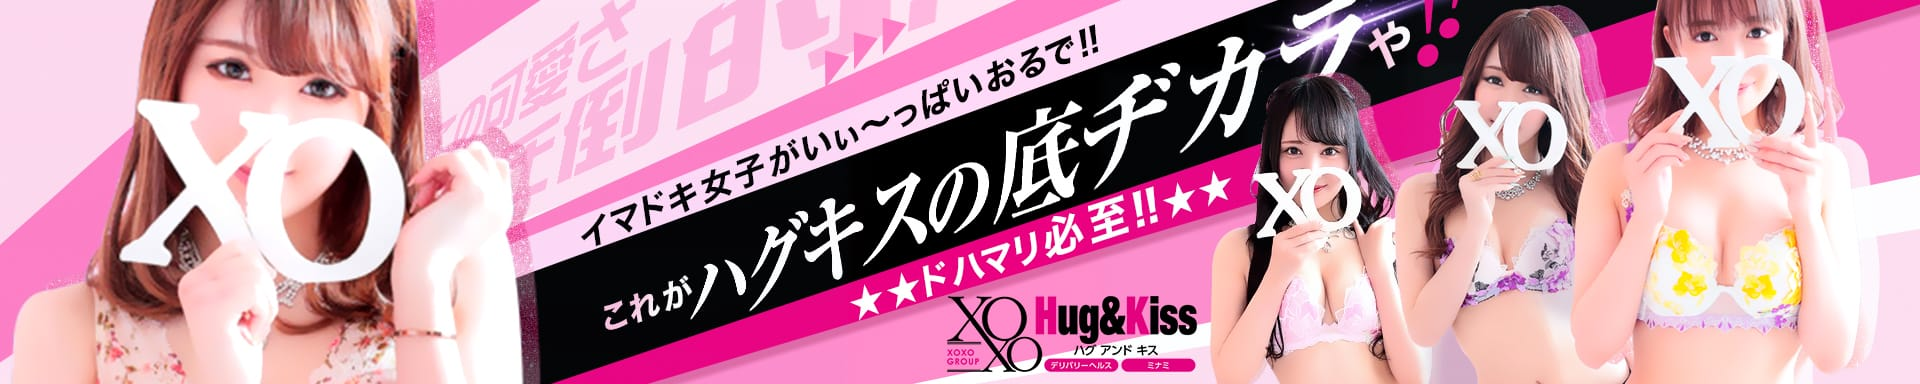 XOXO Hug&Kiss (ハグアンドキス) - 新大阪